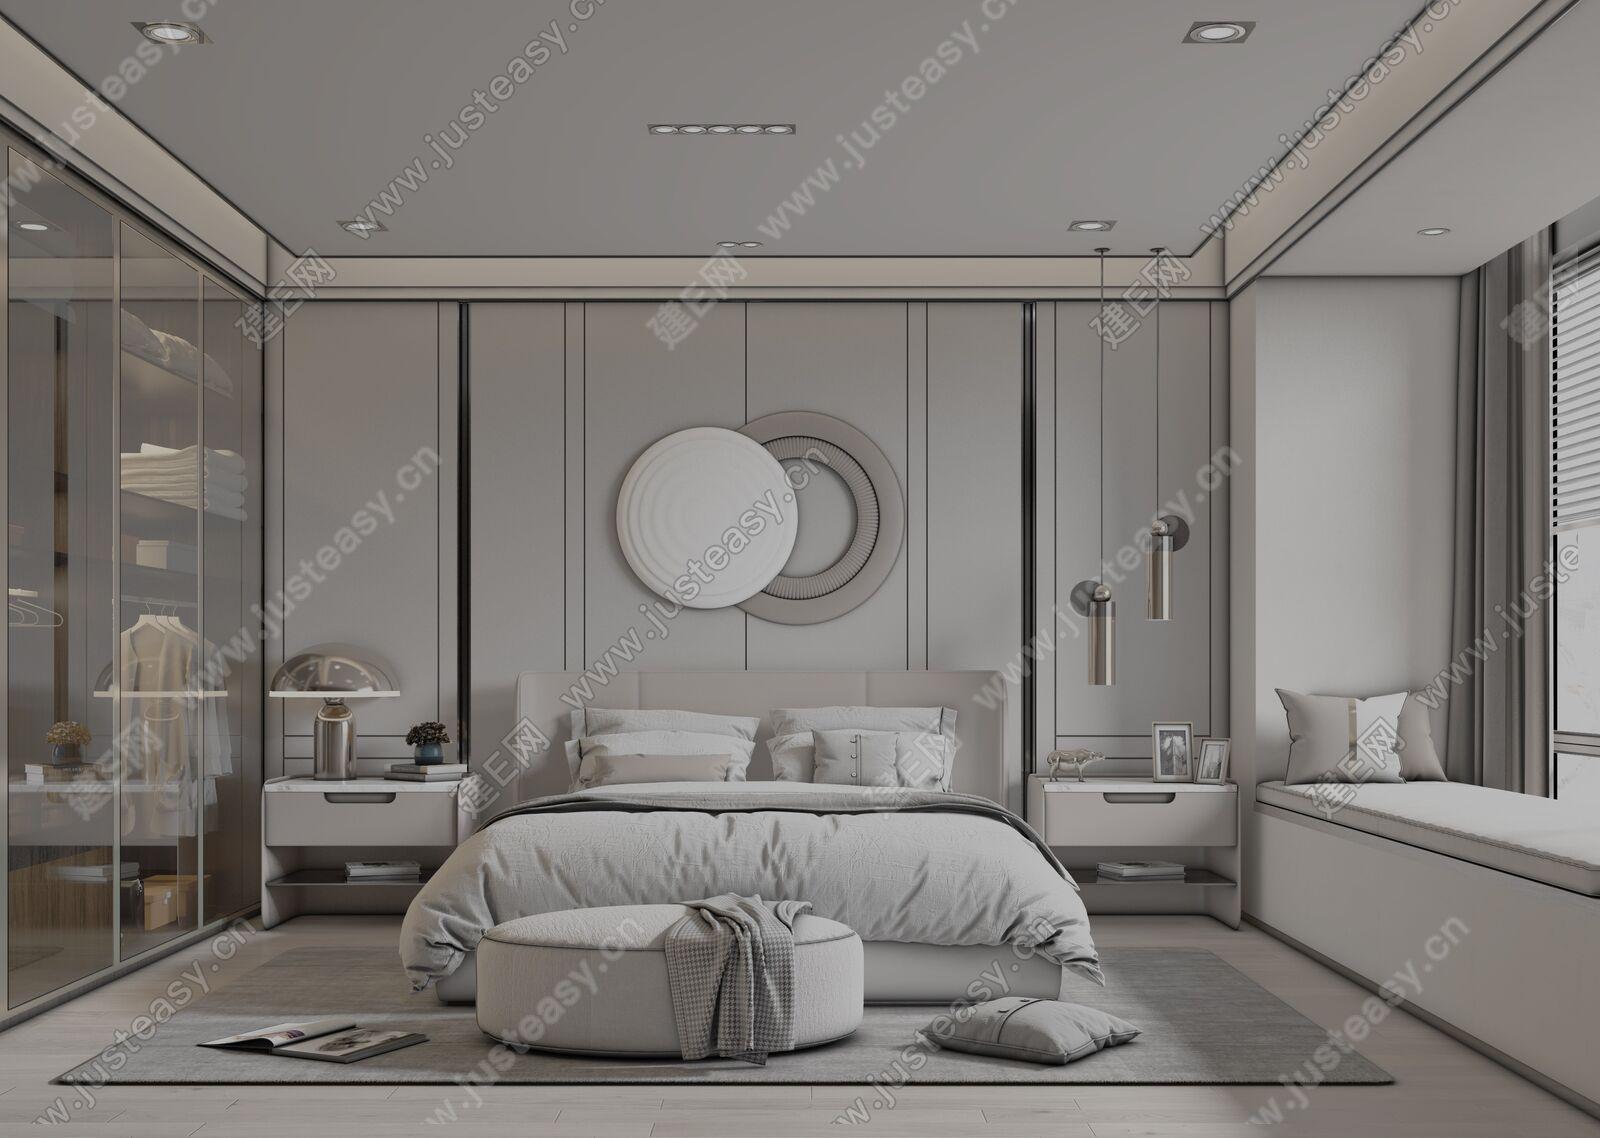 现代卧室sketchup模型